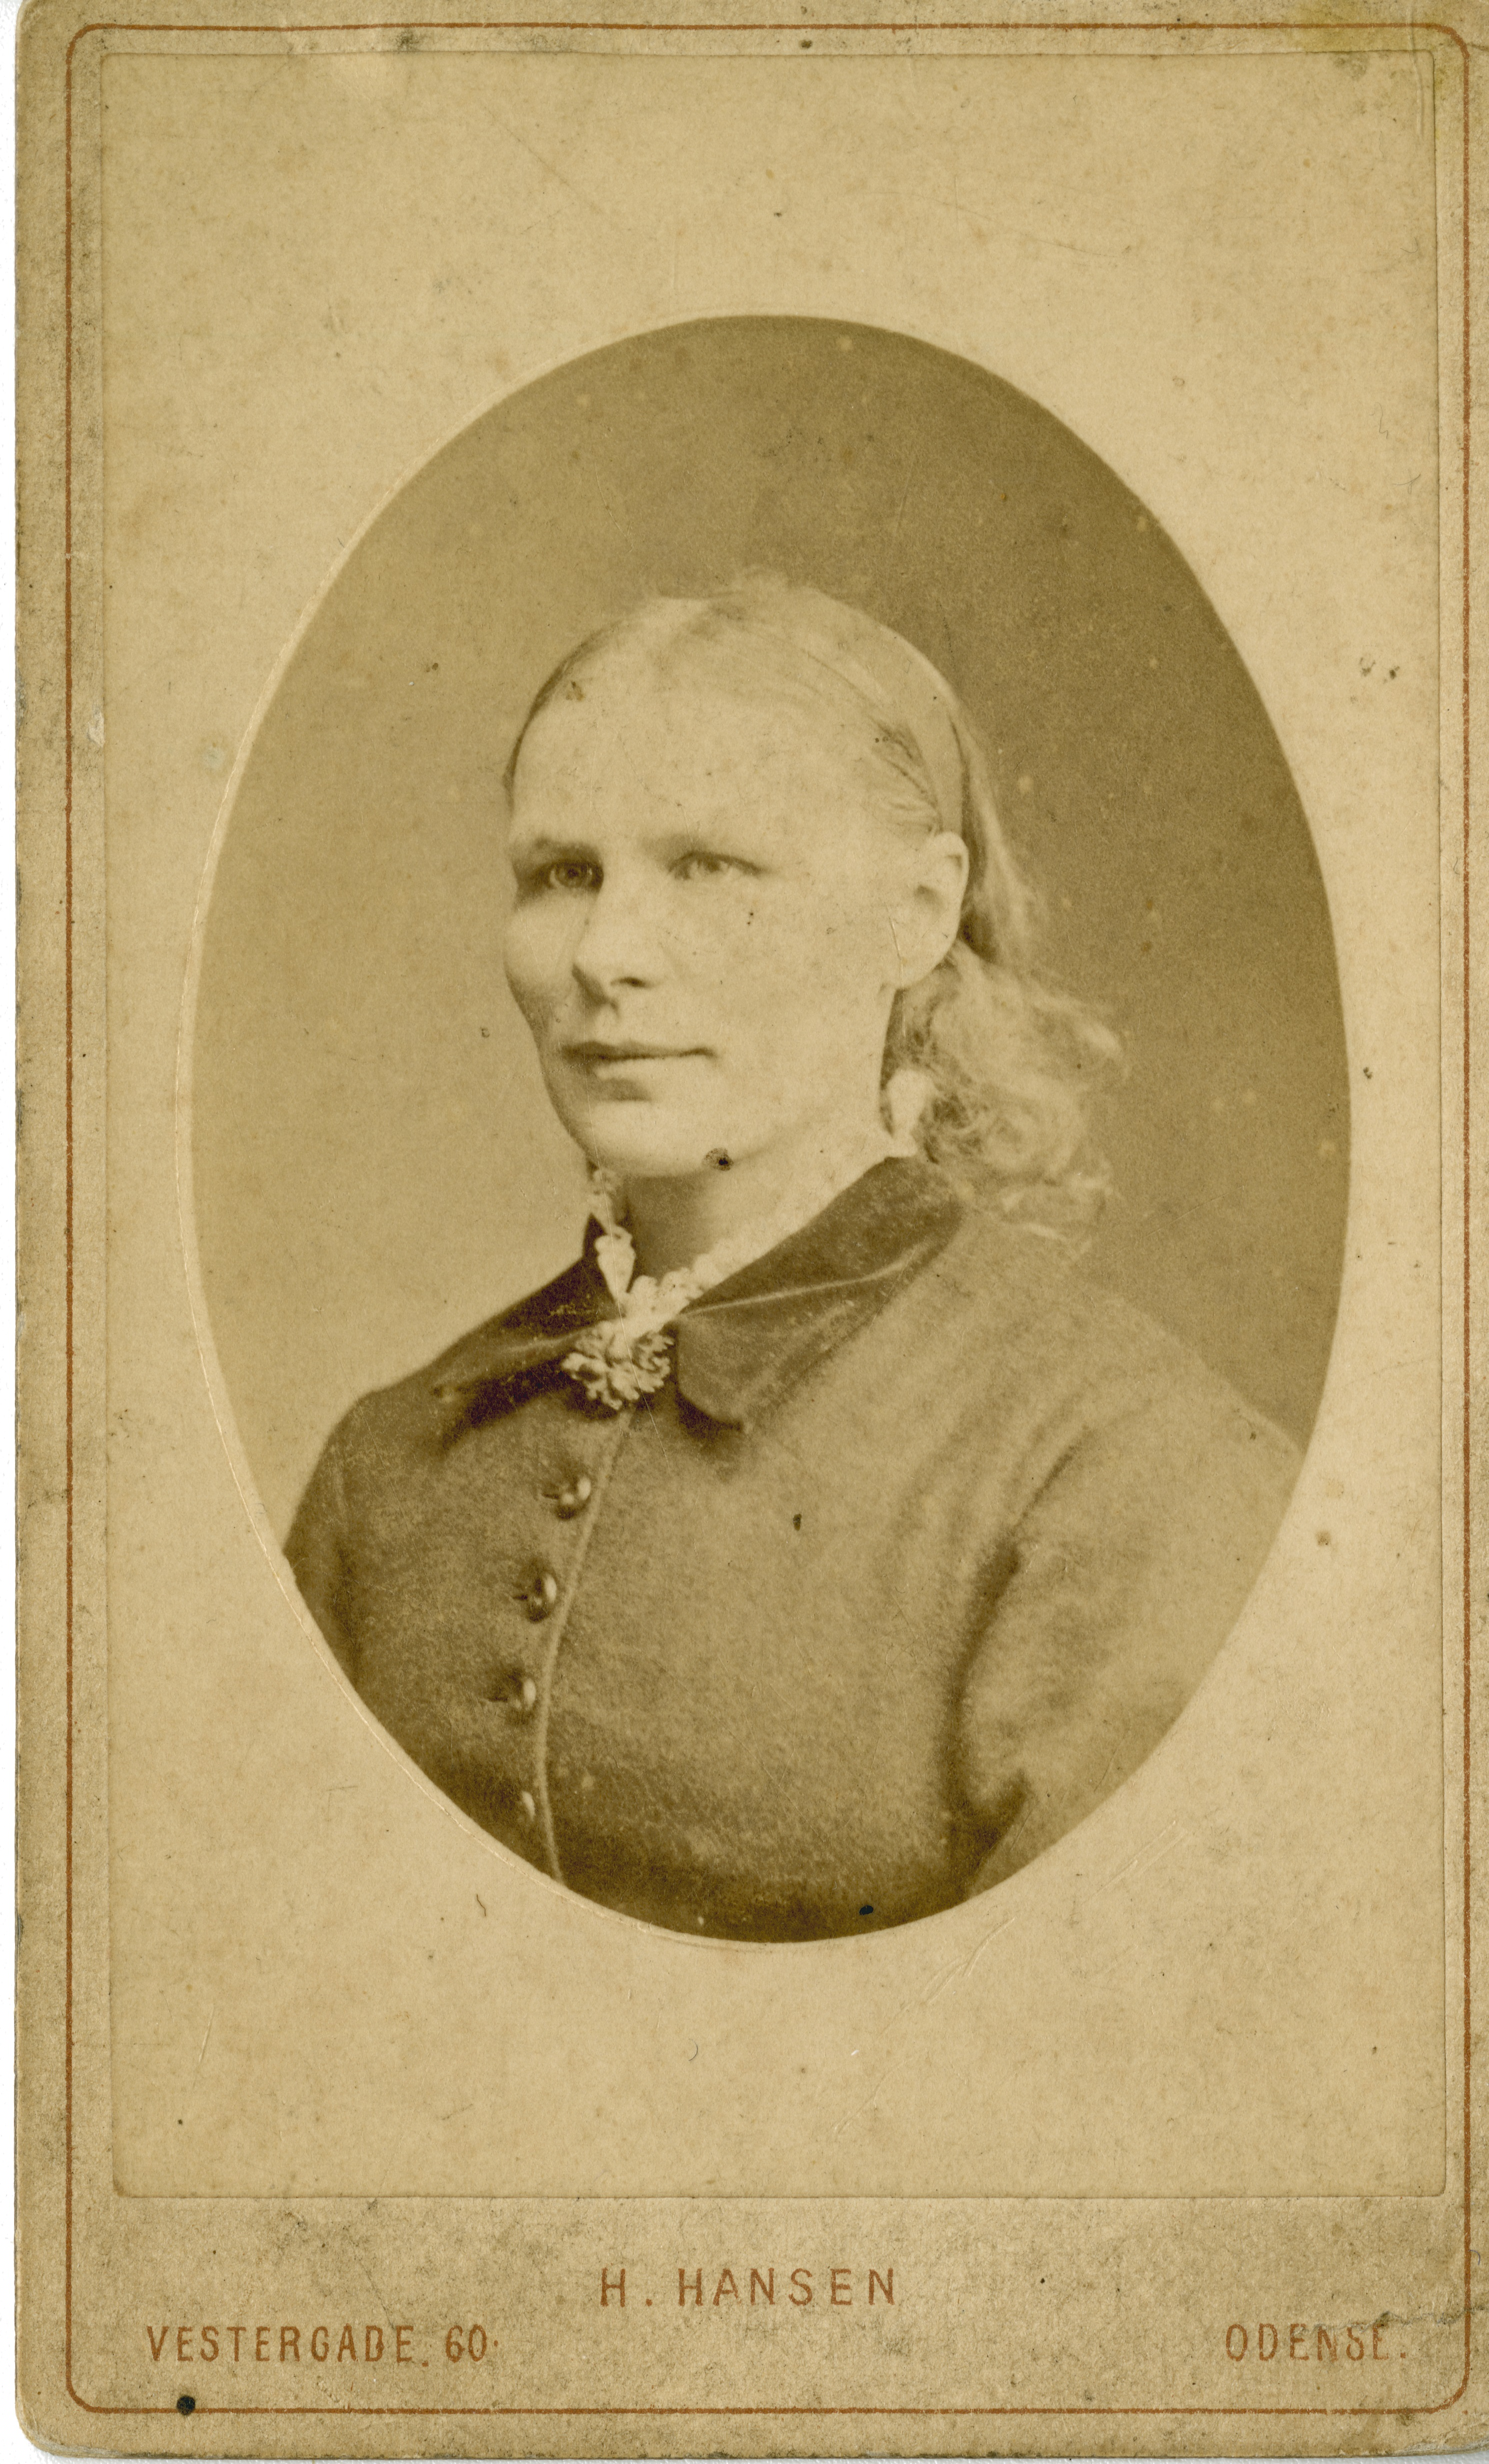 Karen Jørgensen